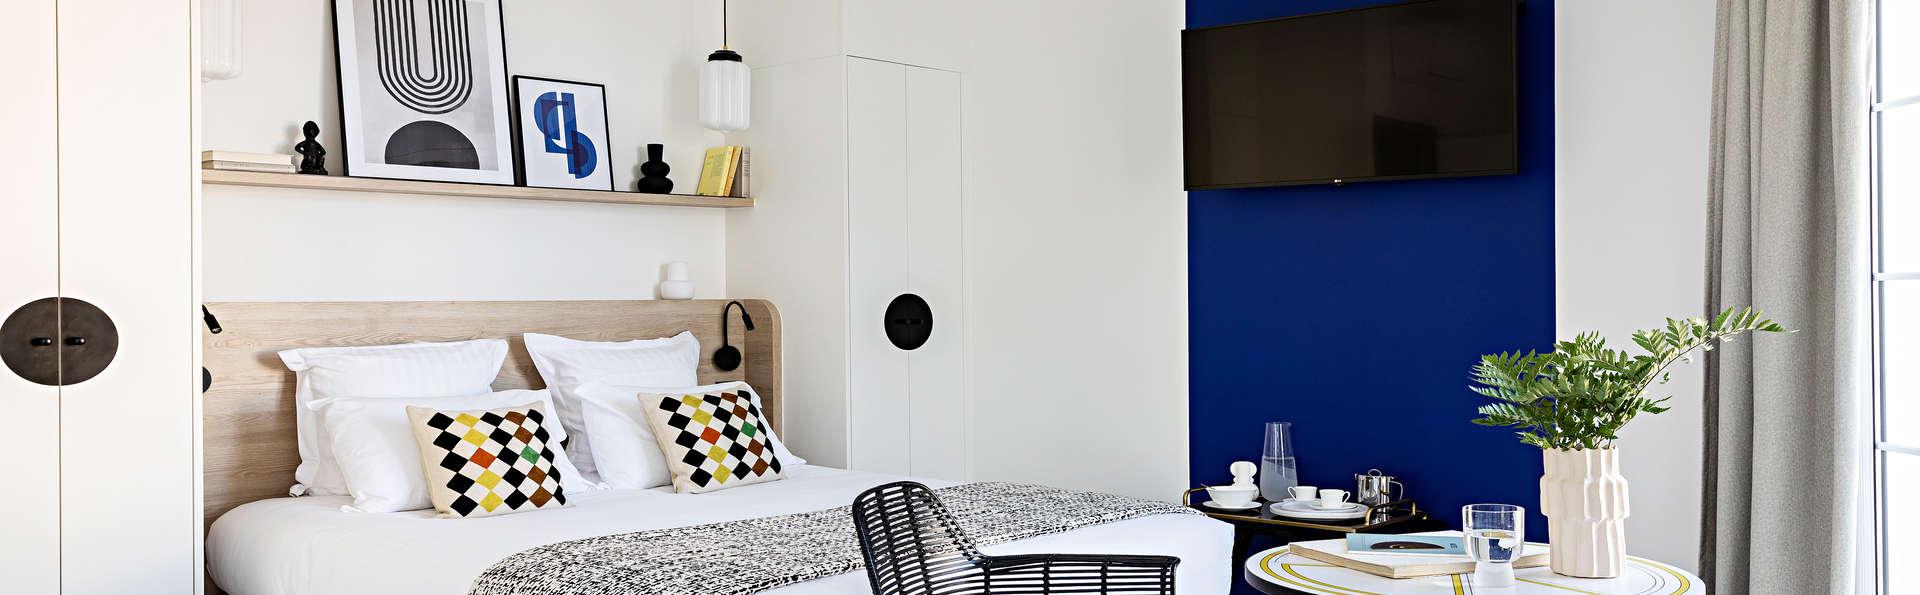 Hotel Le Riviera Collection, BW Signature Collection - _Riviera_Collection_Nice_France_2021__Yann_Deret-3415.jpg